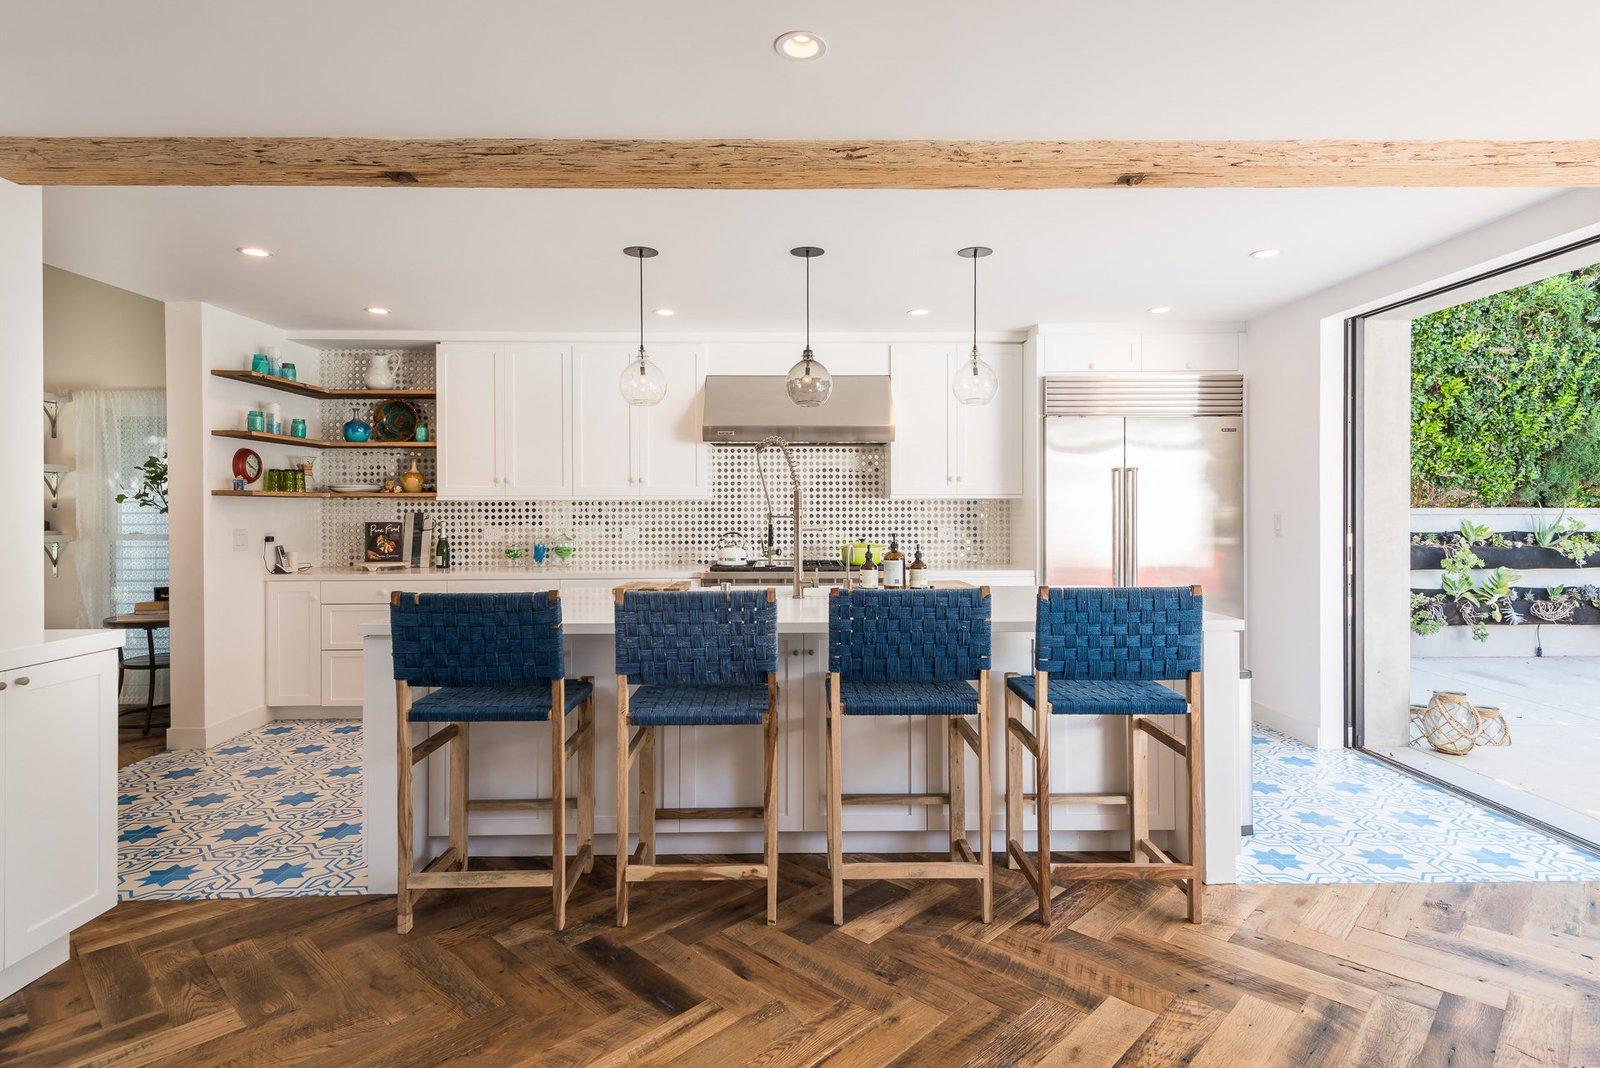 Kitchen, Refrigerator, Range Hood, White Cabinet, and Medium Hardwood Floor  Mid-Century Meets Boho Chic